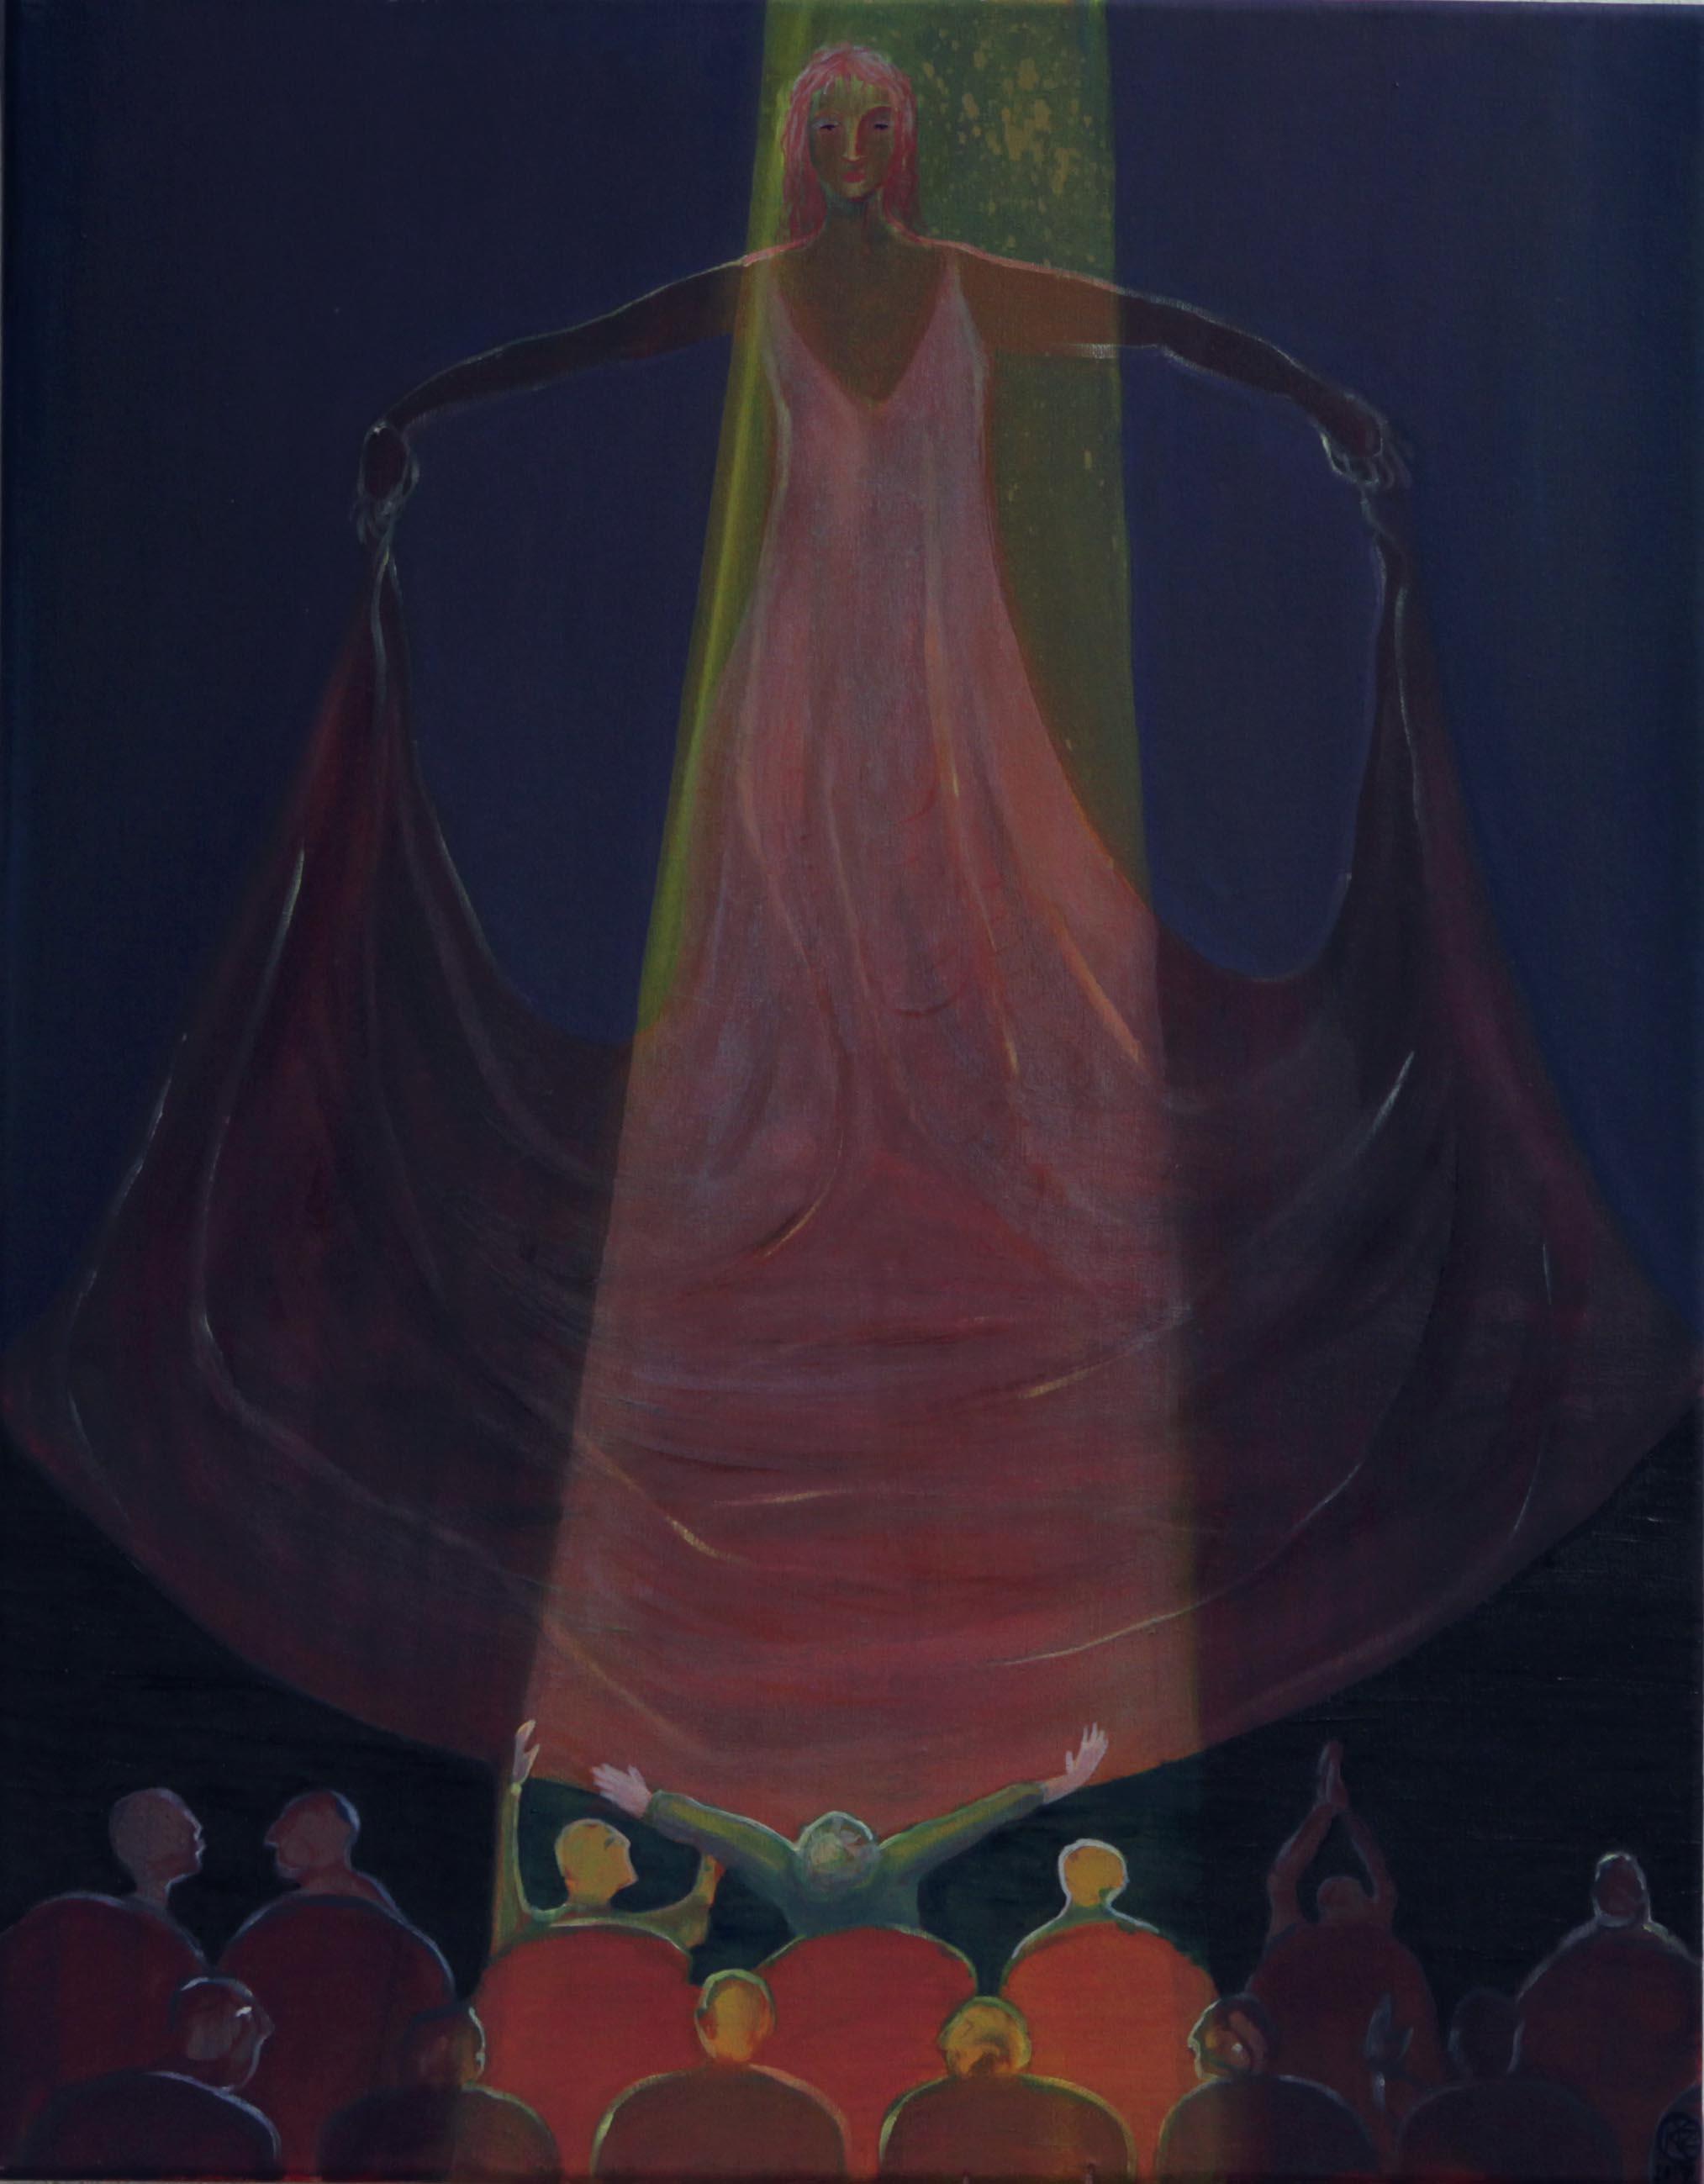 The Magic of Theatre    Oil on canvas, 70x55 cm